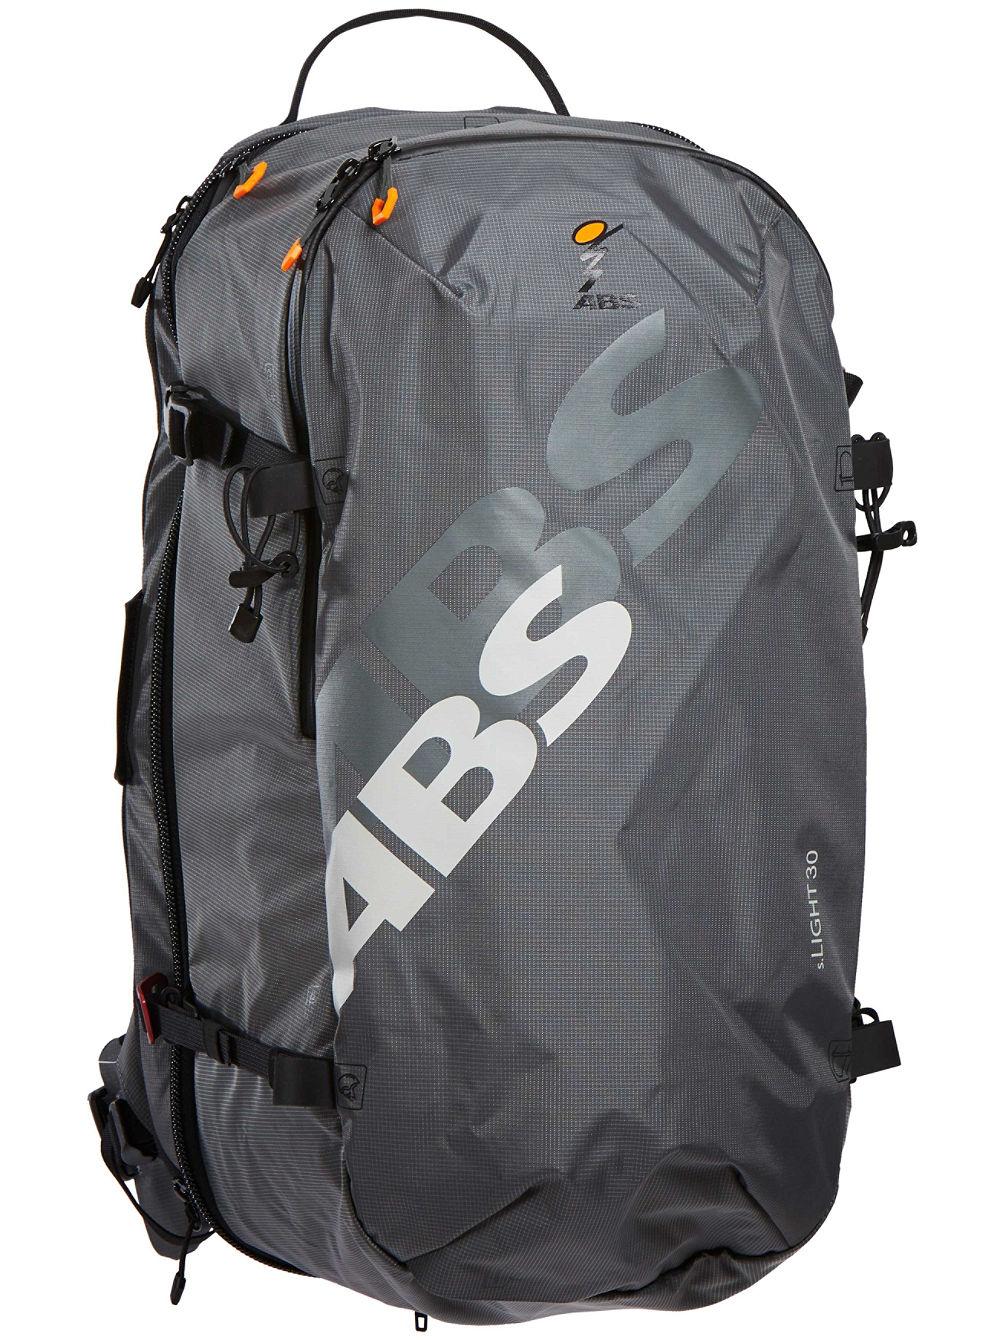 in vendita 9b752 55efd S.Light Base Unit + S.Light 30L Zaino